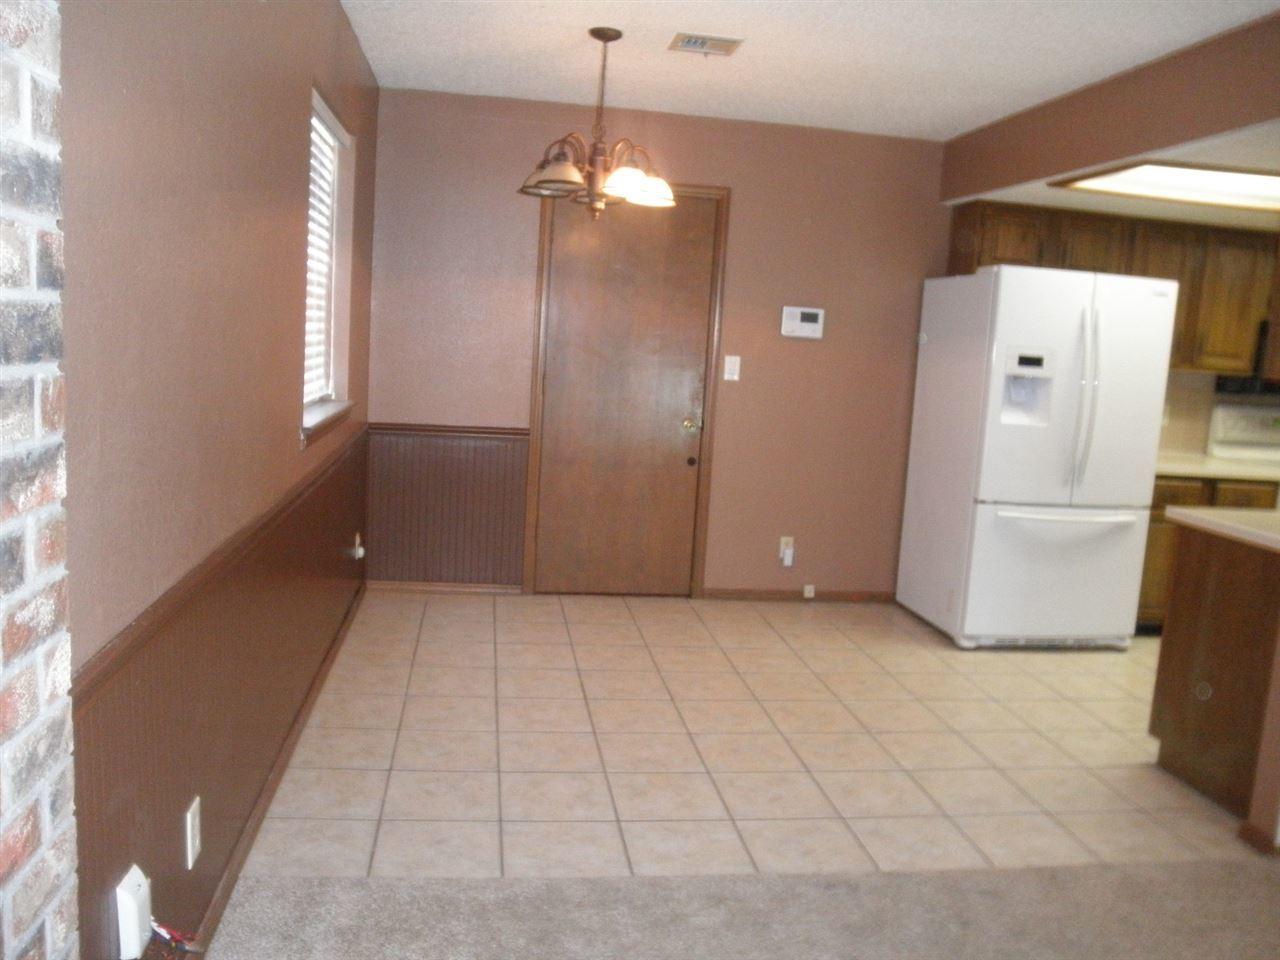 Sold Cross Sale W/ MLS | 300 Lora Ponca City, OK 74601 8